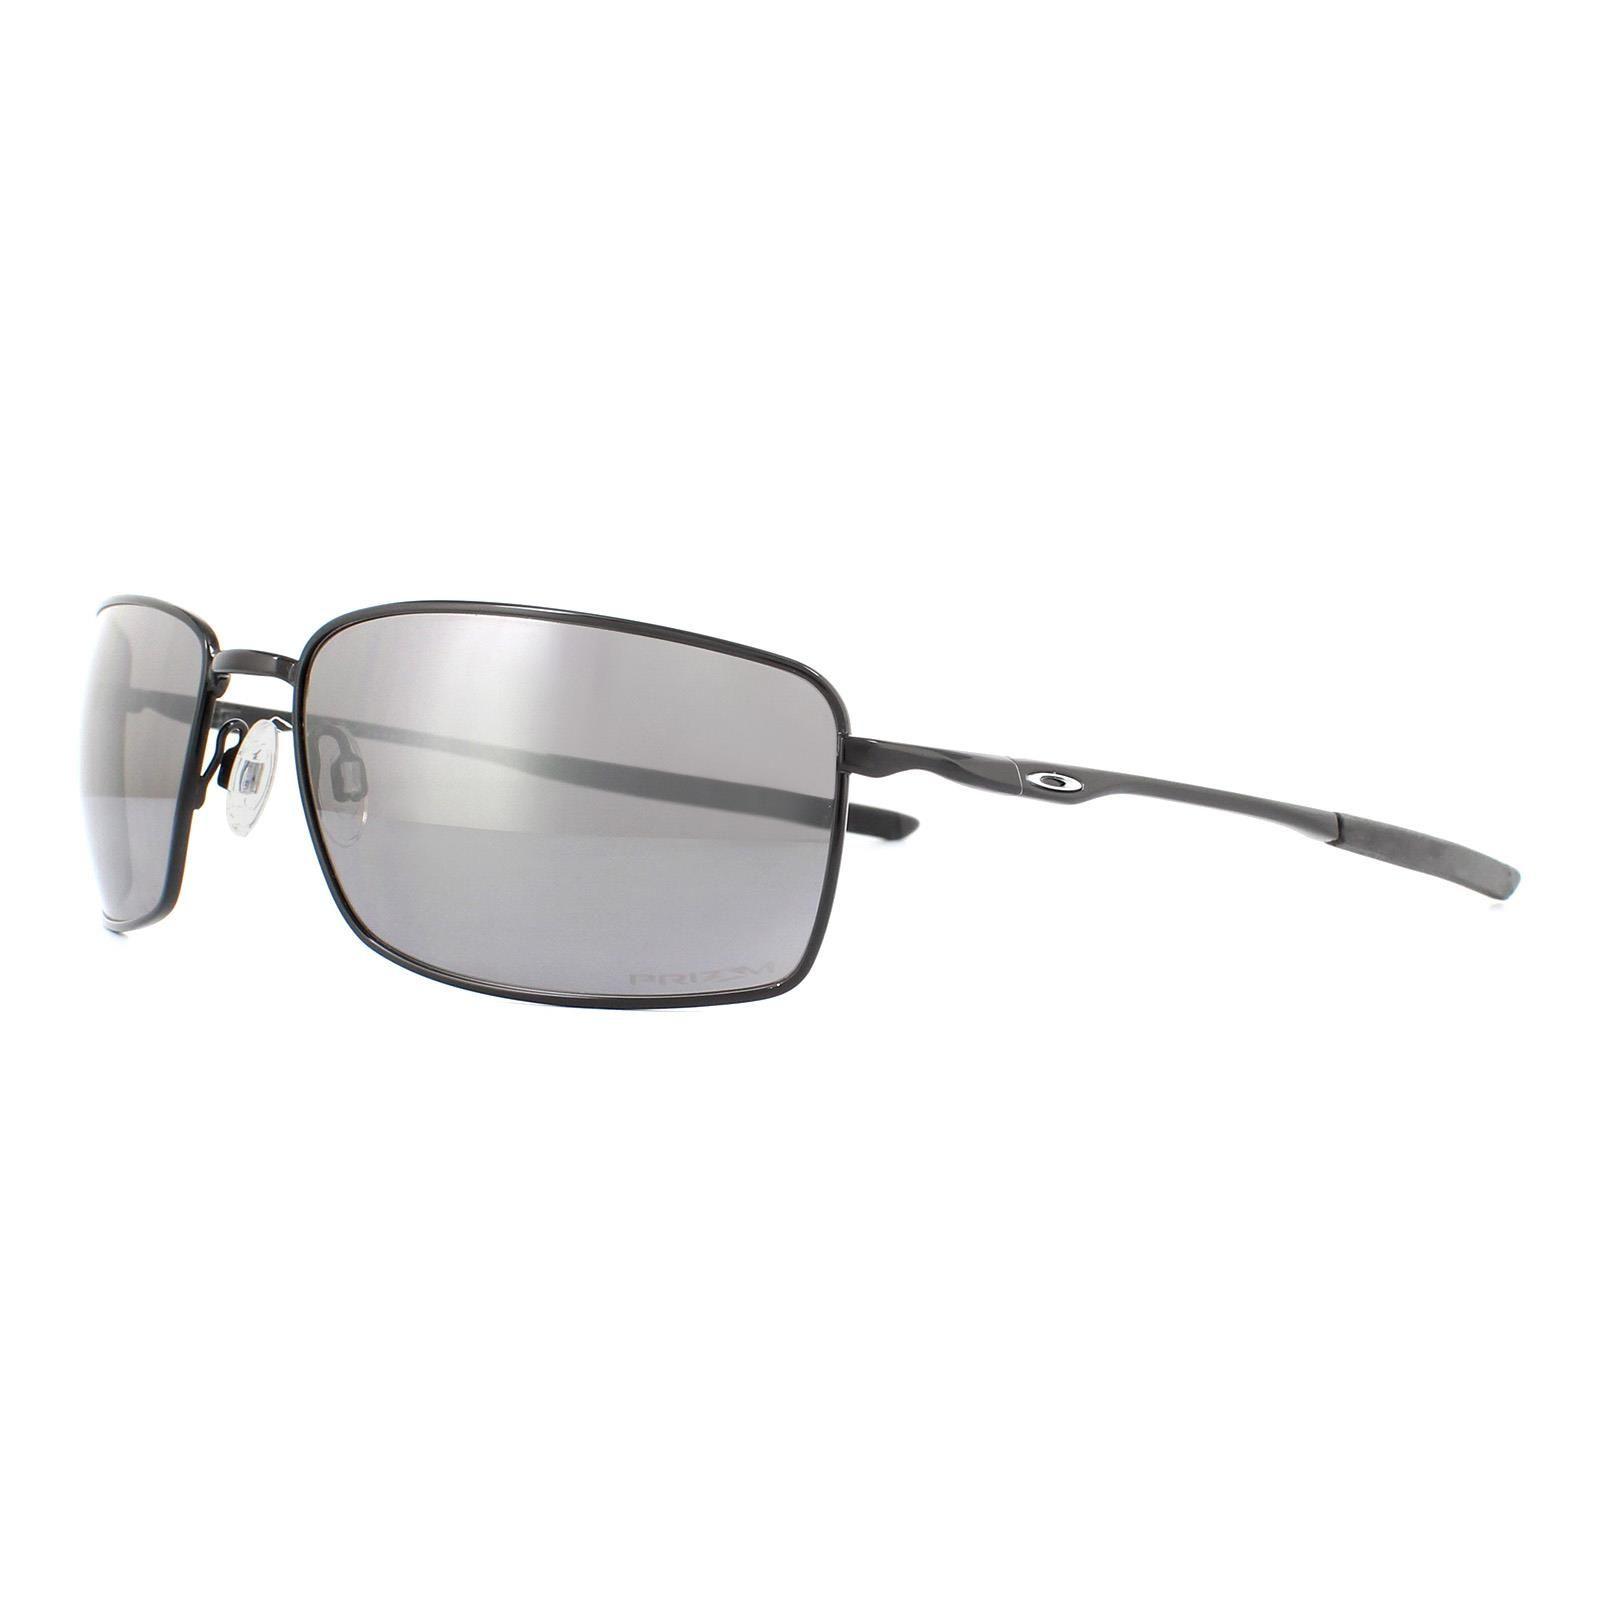 Oakley Sunglasses Square Wire OO4075-13 Polished Black Prizm Black